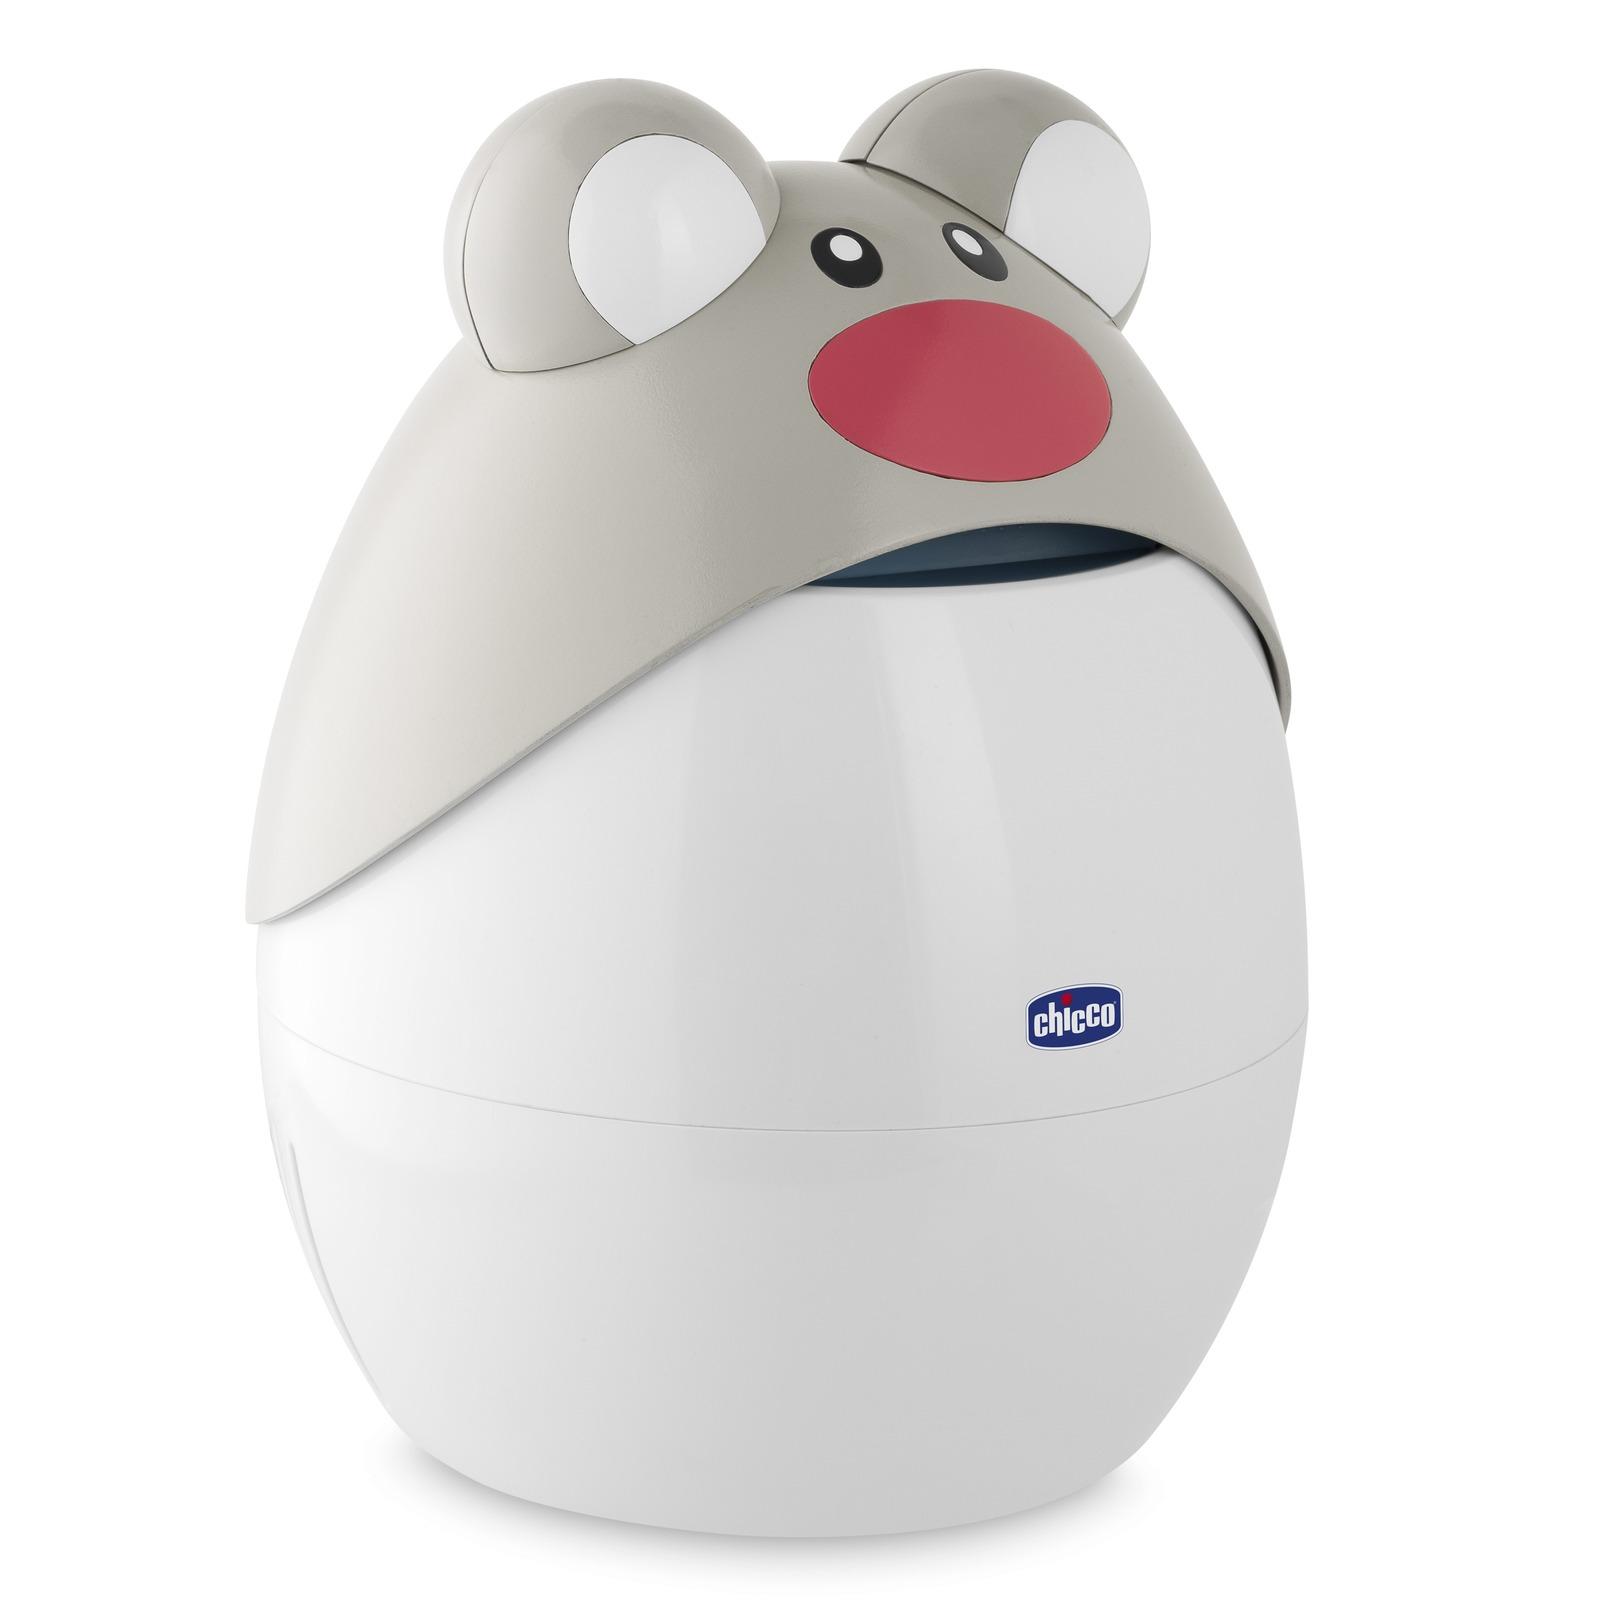 Aparat Pentru Aerosoli (nebulizator) Chicco Ursulet imagine